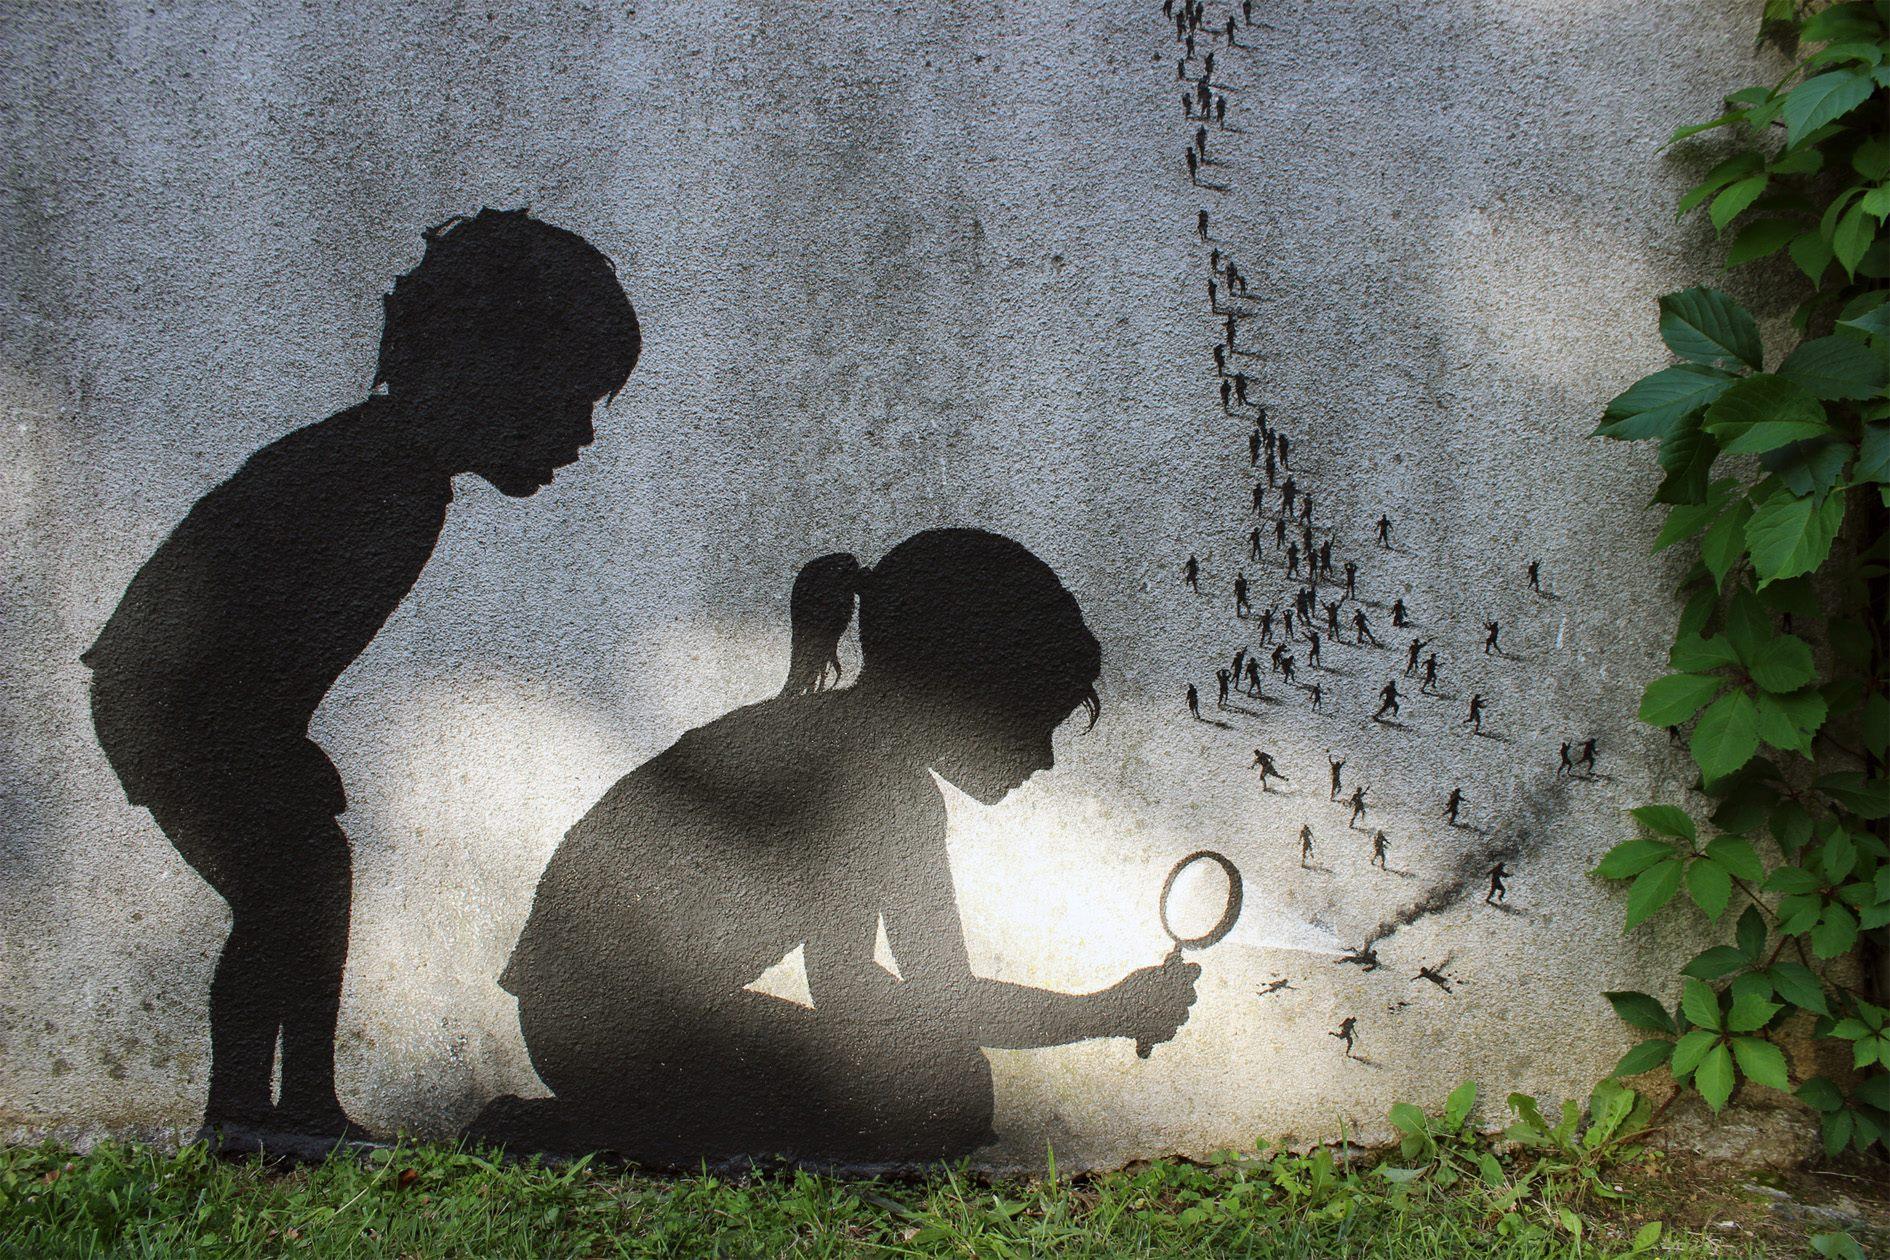 Creative-street-art-pejac-2